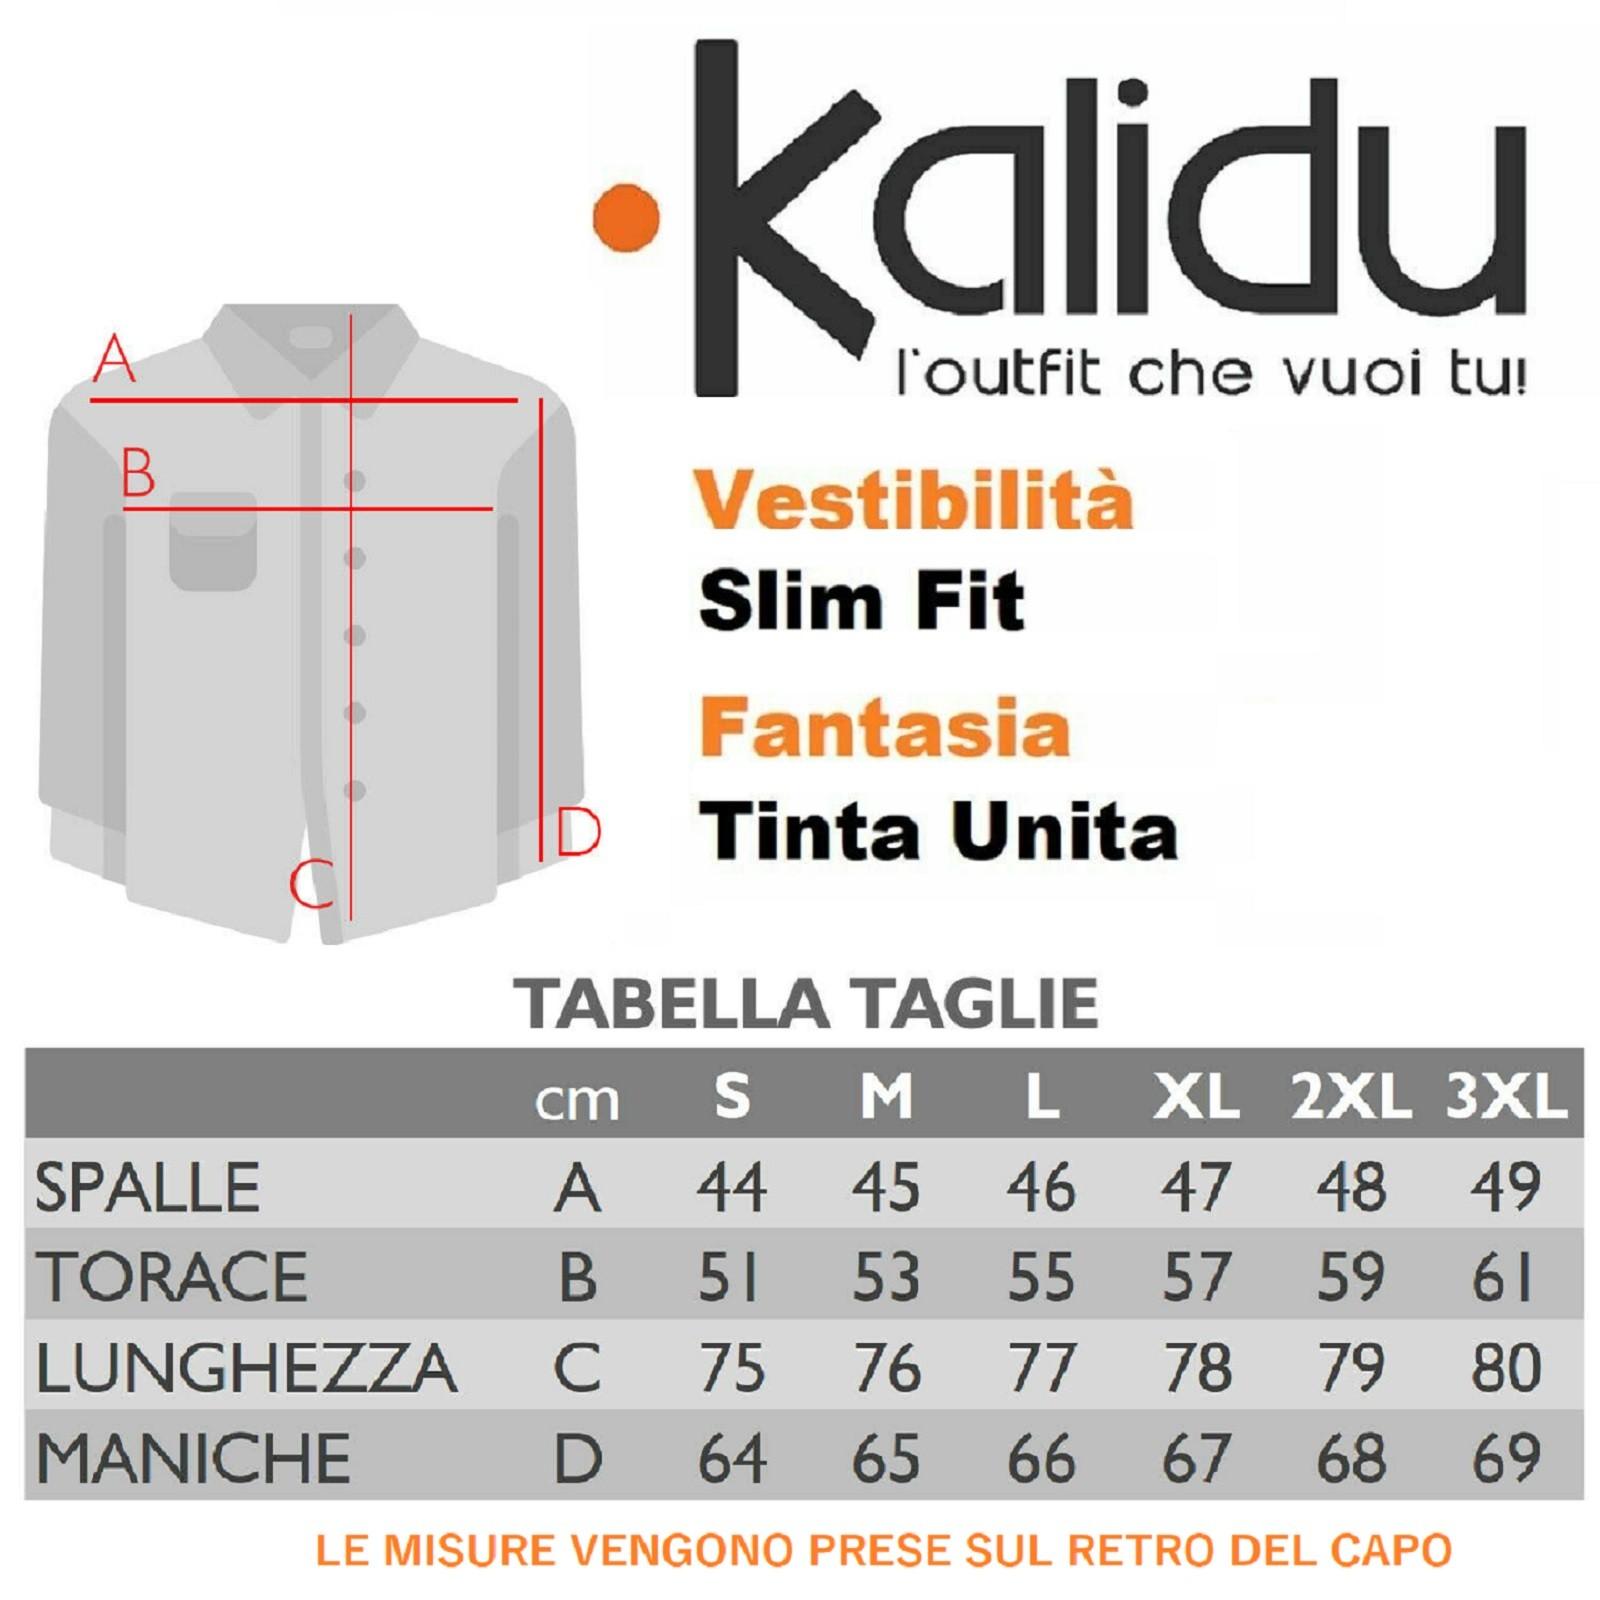 Camicia-Uomo-Celeste-Bianca-Slim-Fit-Manica-Lunga-Sartoriale-Cotone-TG-S-7XL miniatura 15